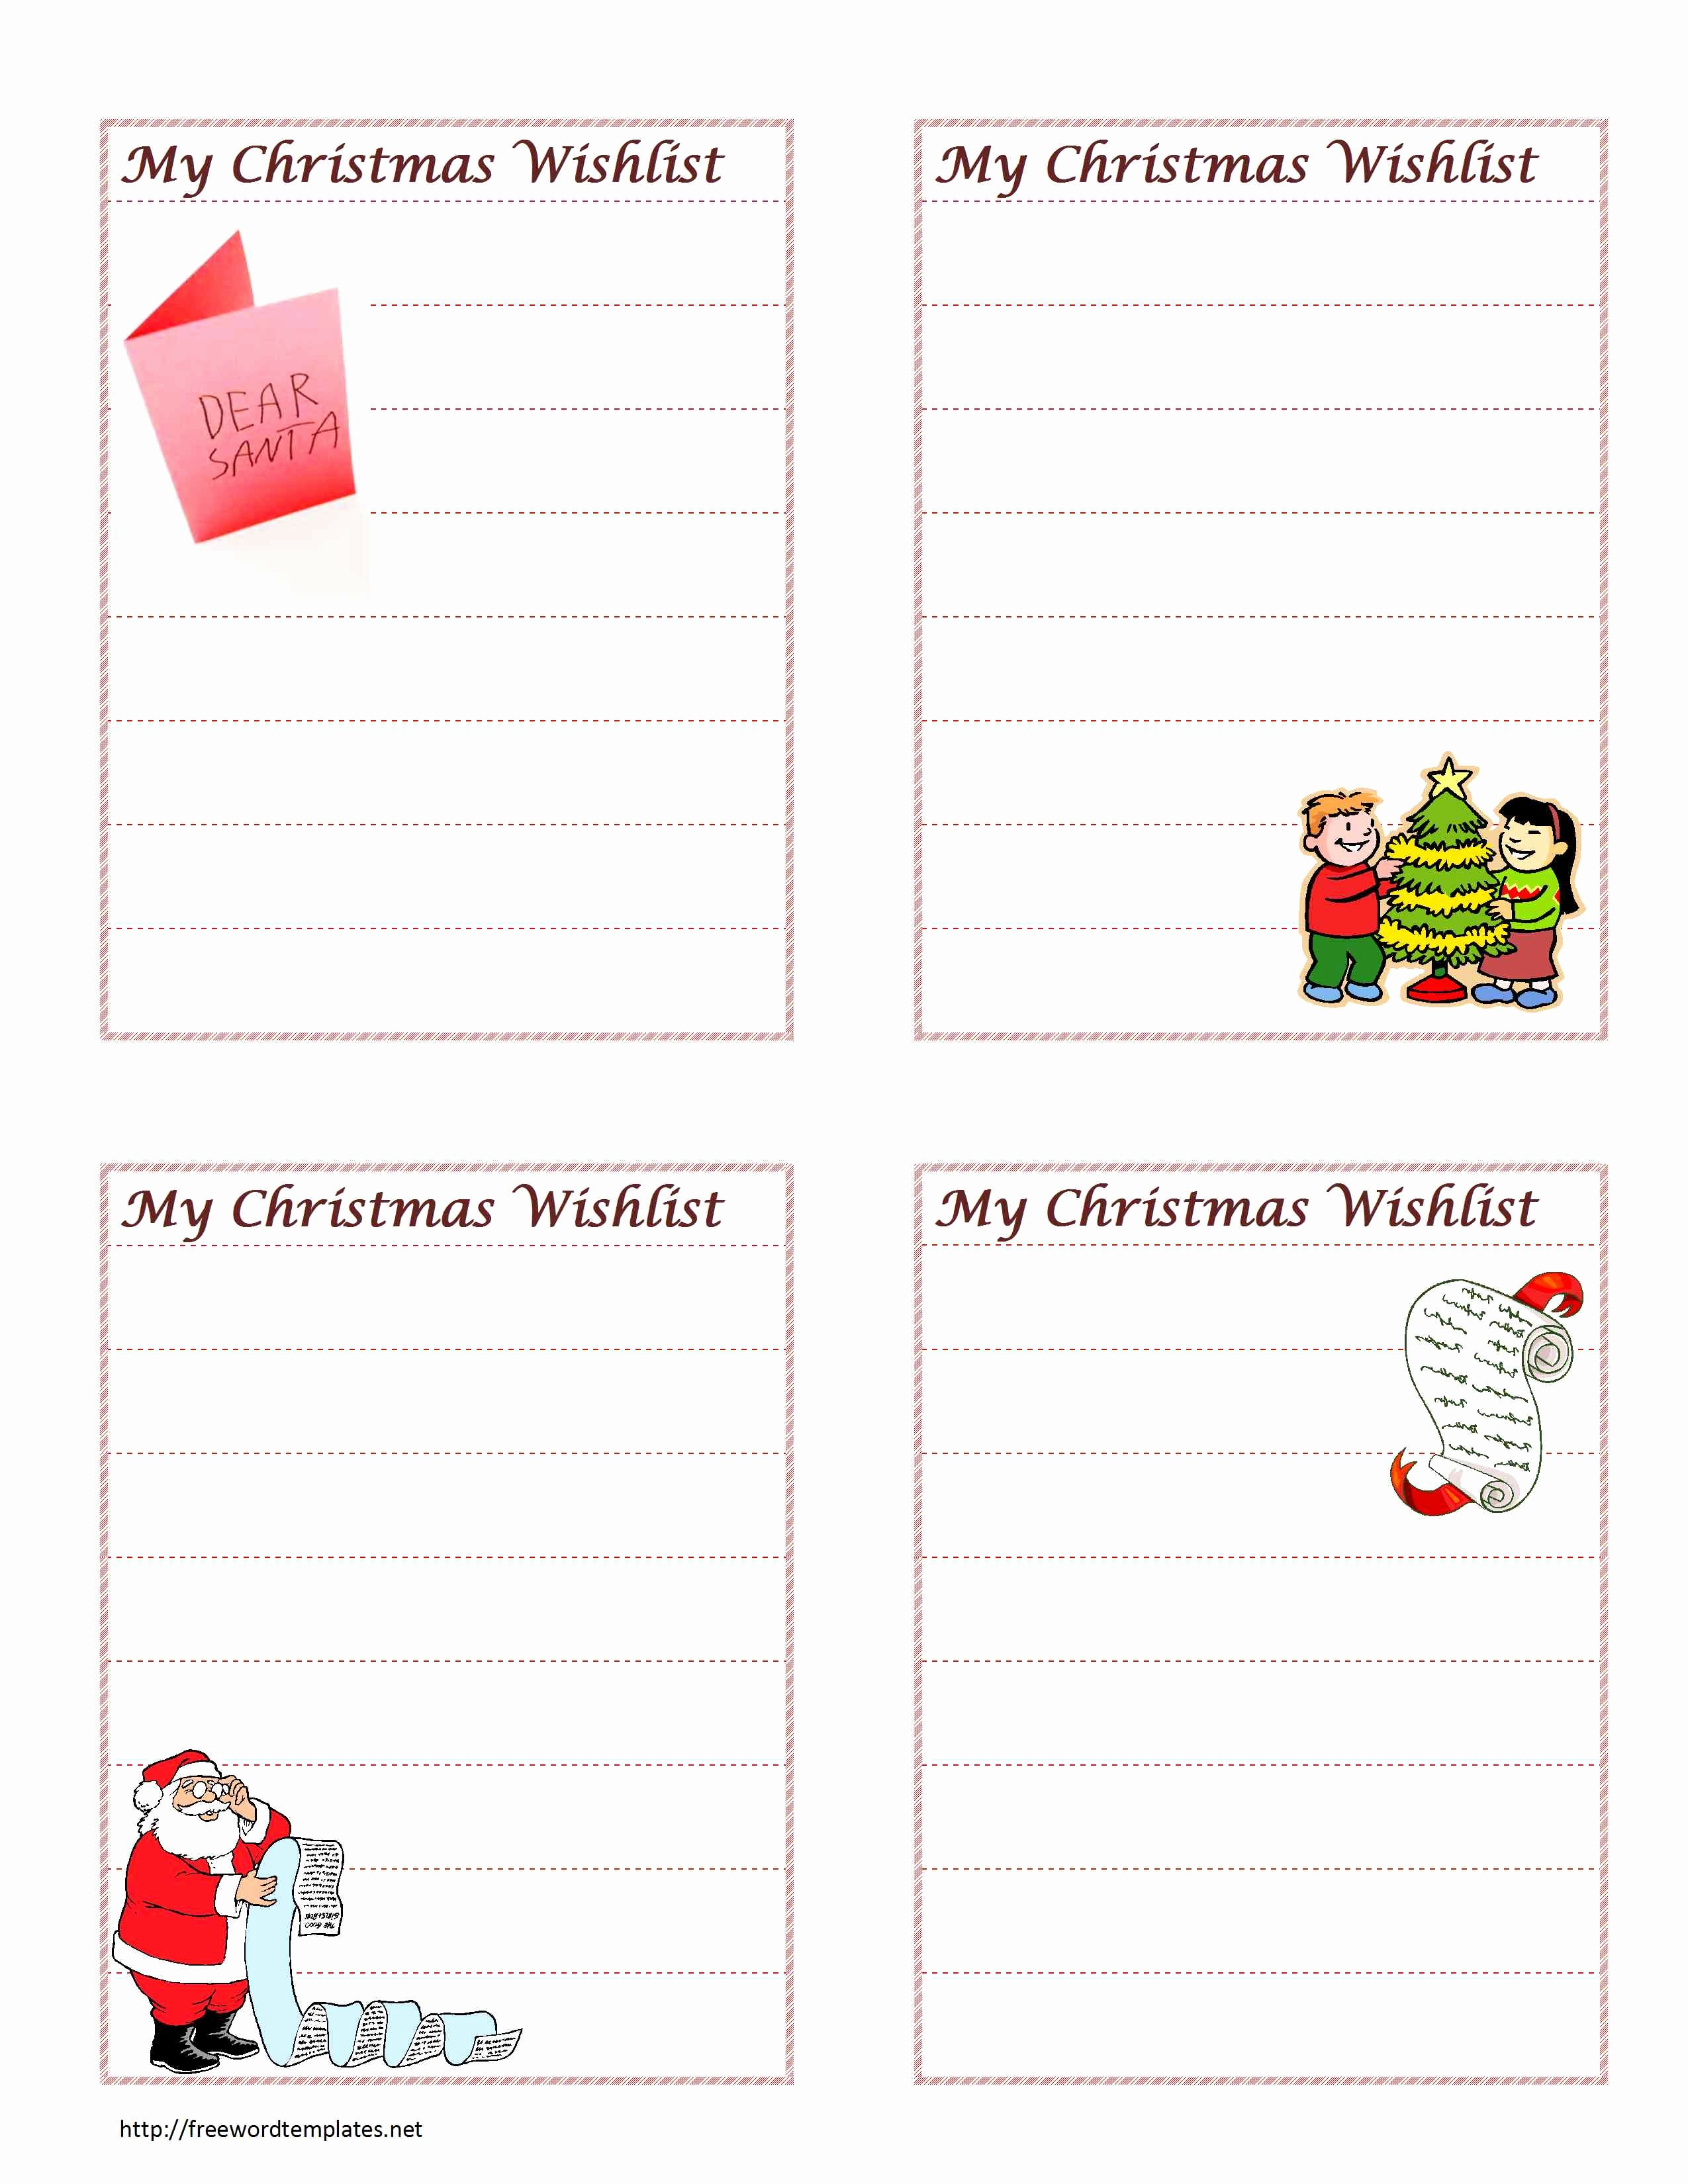 Wish List Template Microsoft Word Awesome Christmas Wish List Template